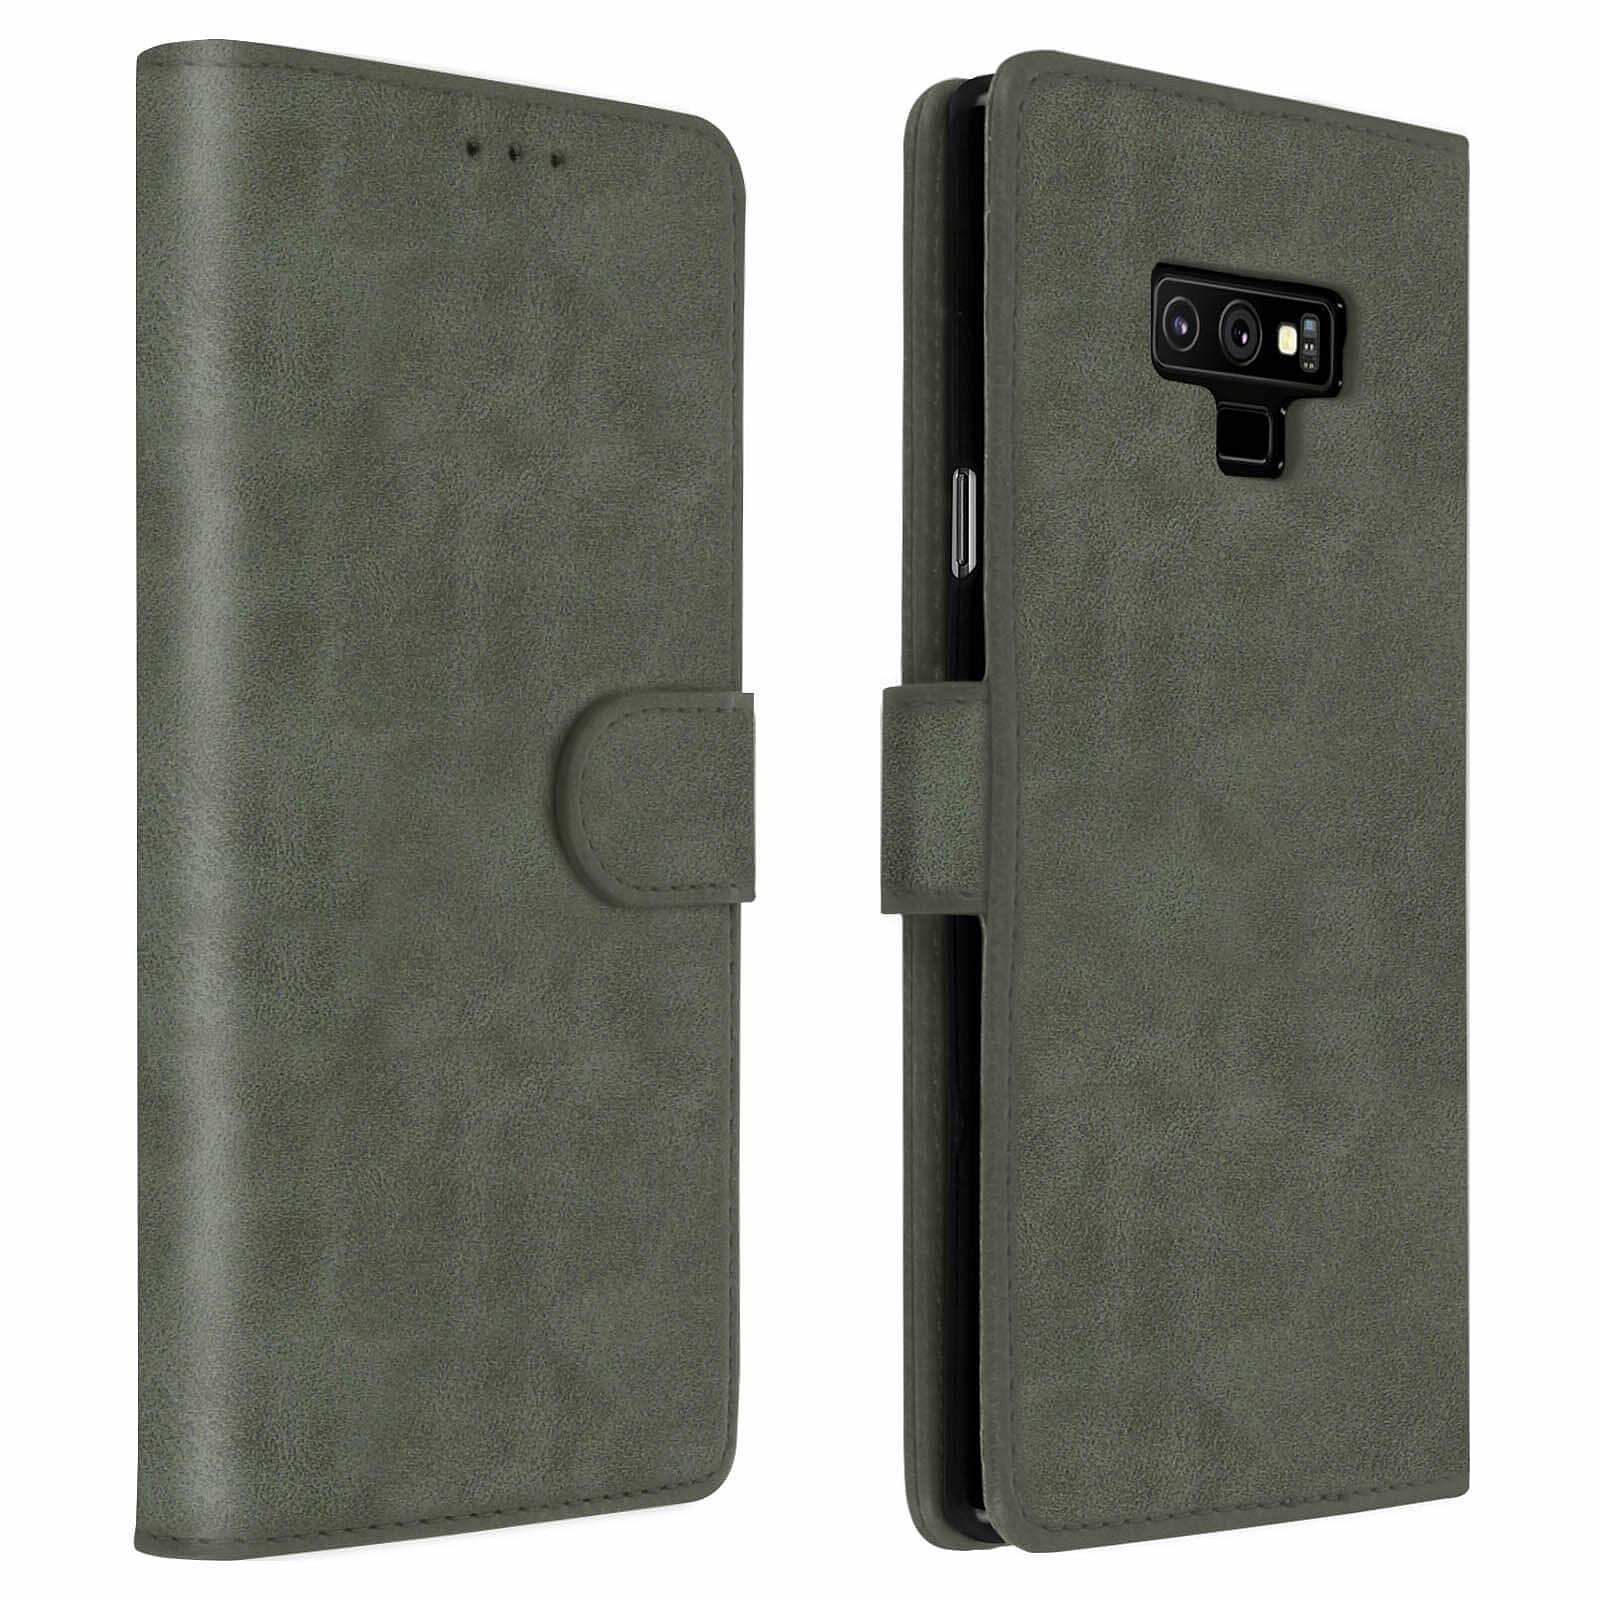 Avizar Etui folio Gris pour Samsung Galaxy Note 9